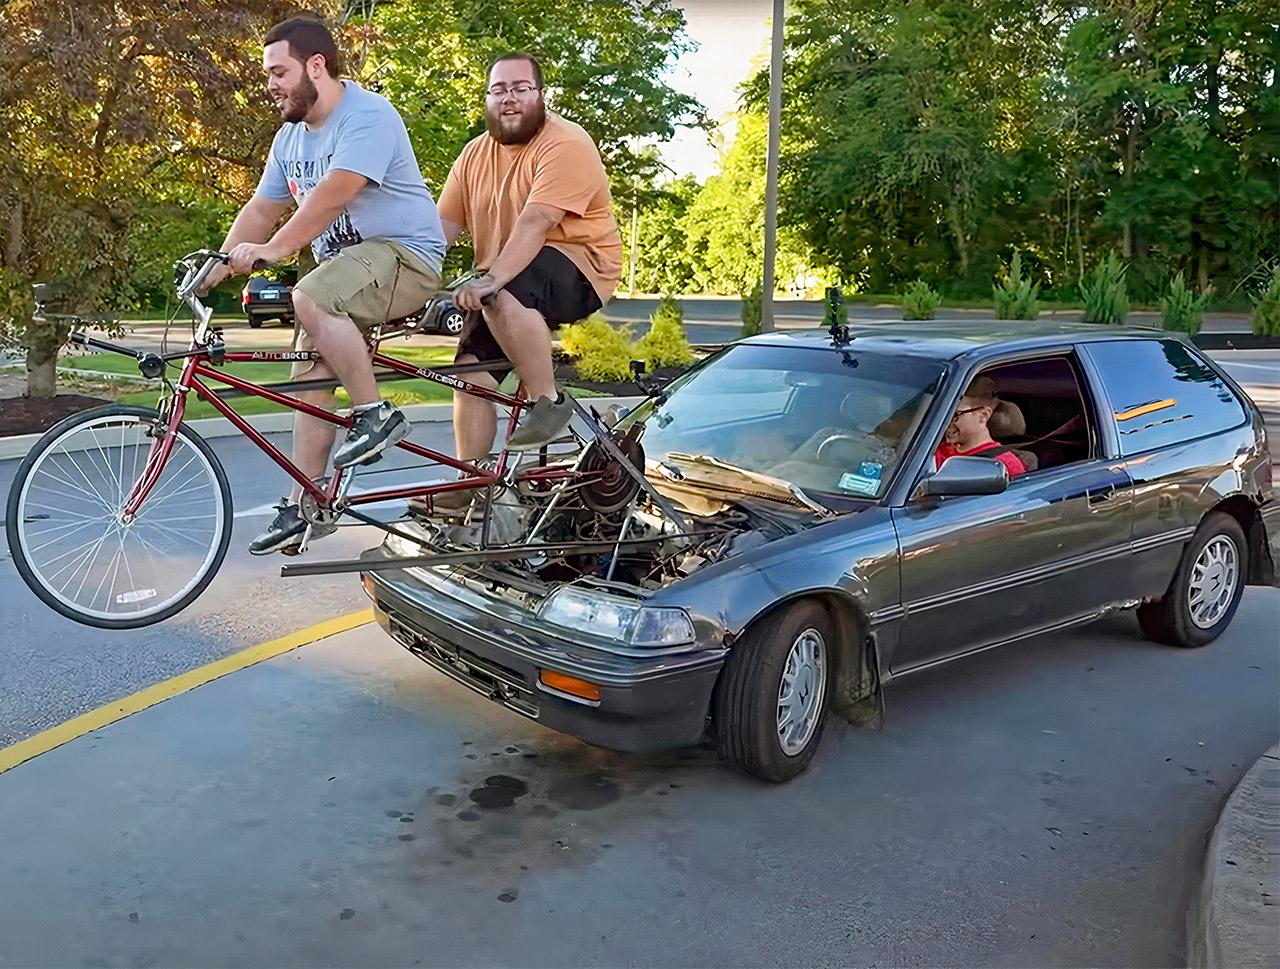 Custom Bicycle-Powered Car